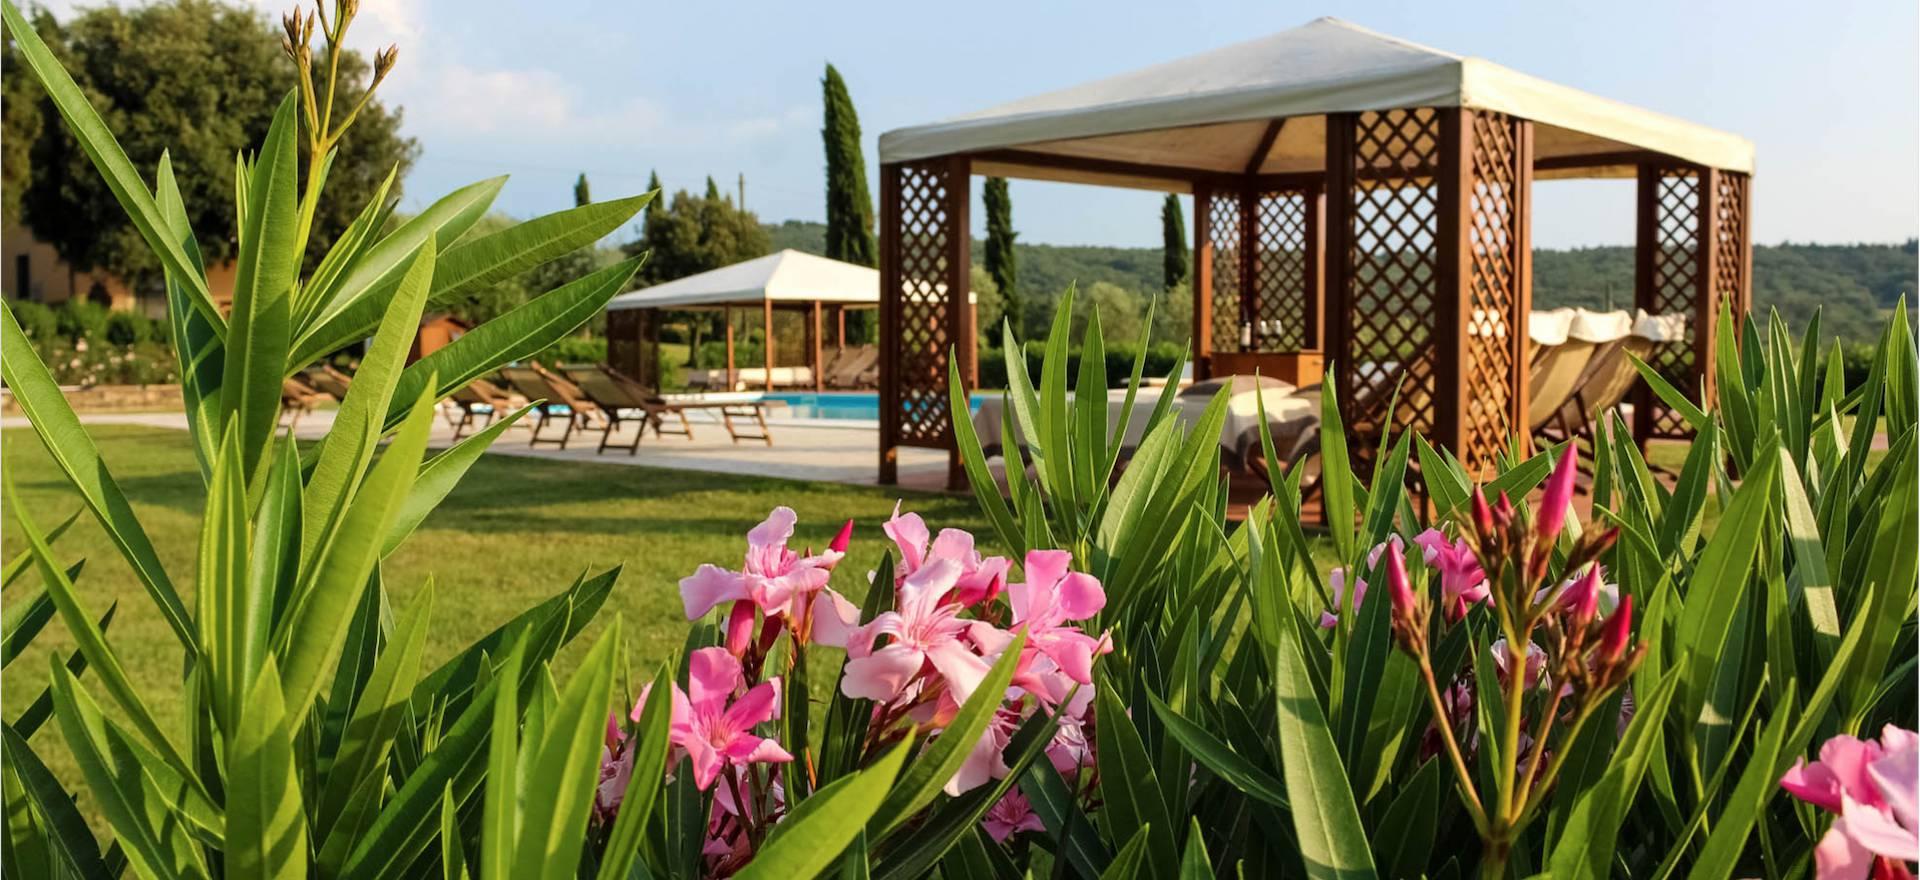 Agriturismo Toscana Agriturismo in Toscana con ristorante e wine bar panoramico